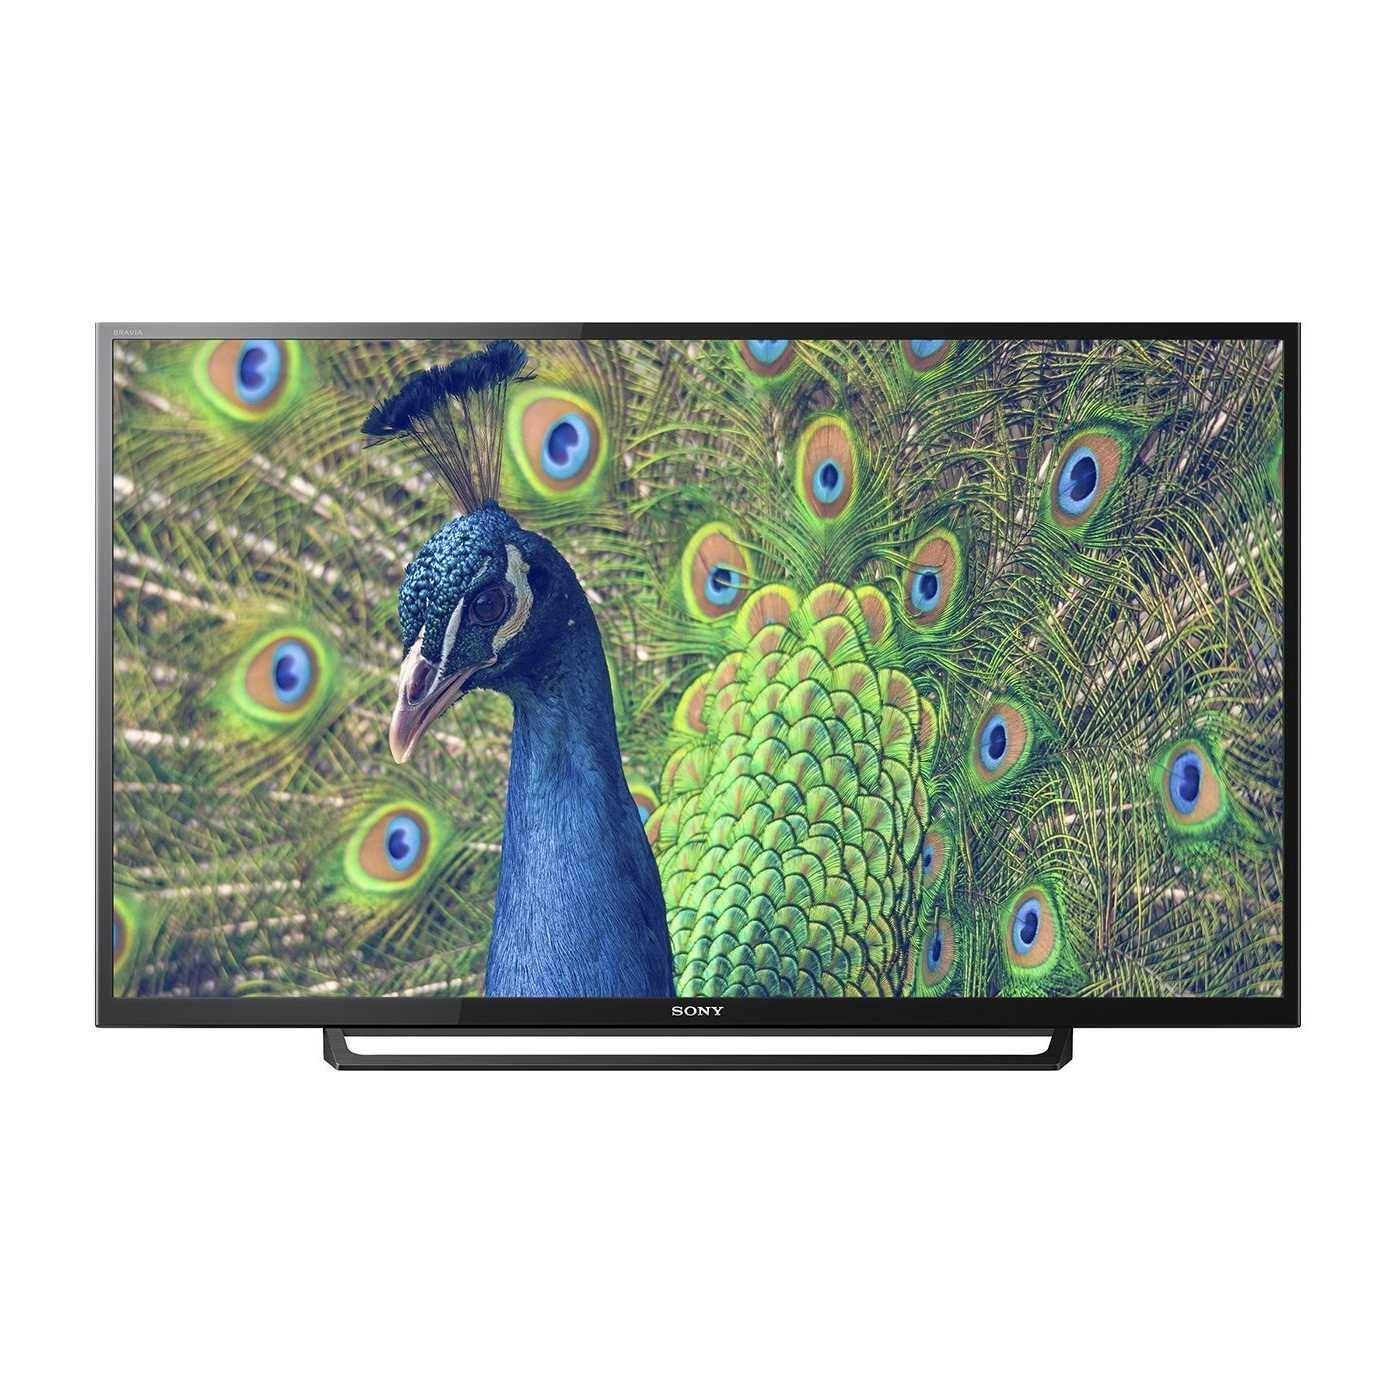 Sony Bravia KLV-40R352E 40 Inch Full HD LED Television